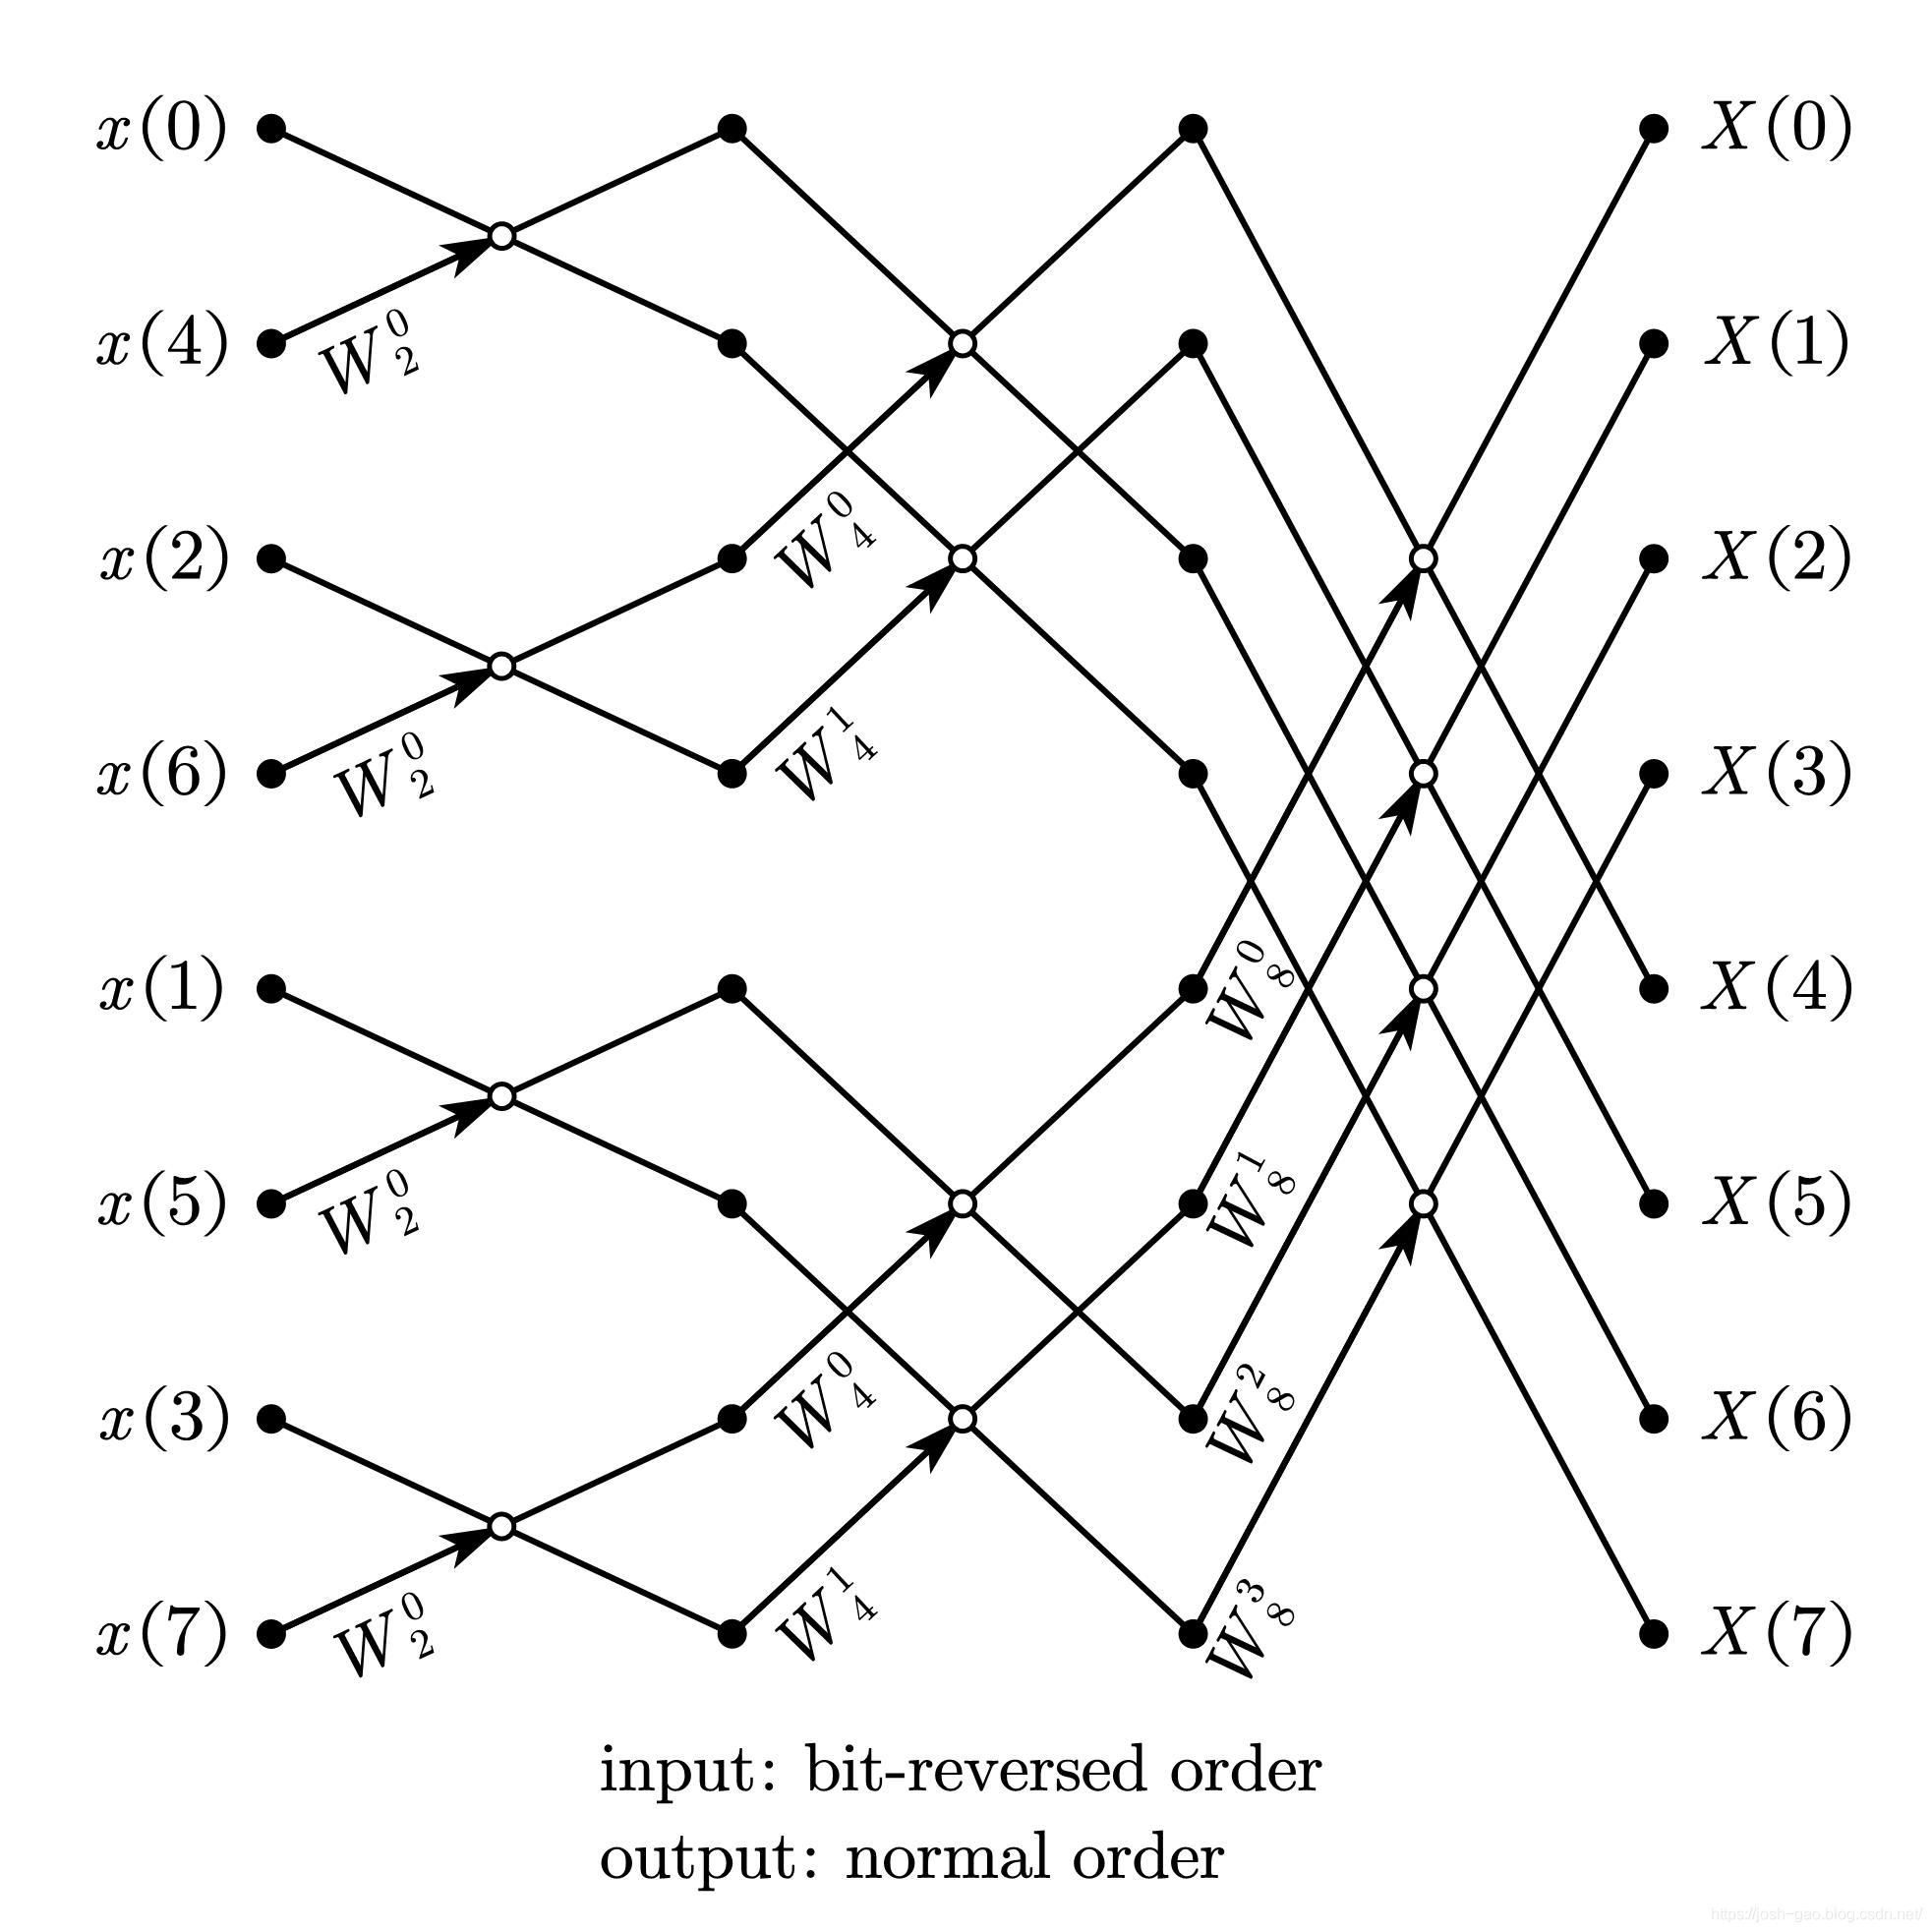 8-point radix-2 DIT-FFT 比特位反序输入、自然顺序输出